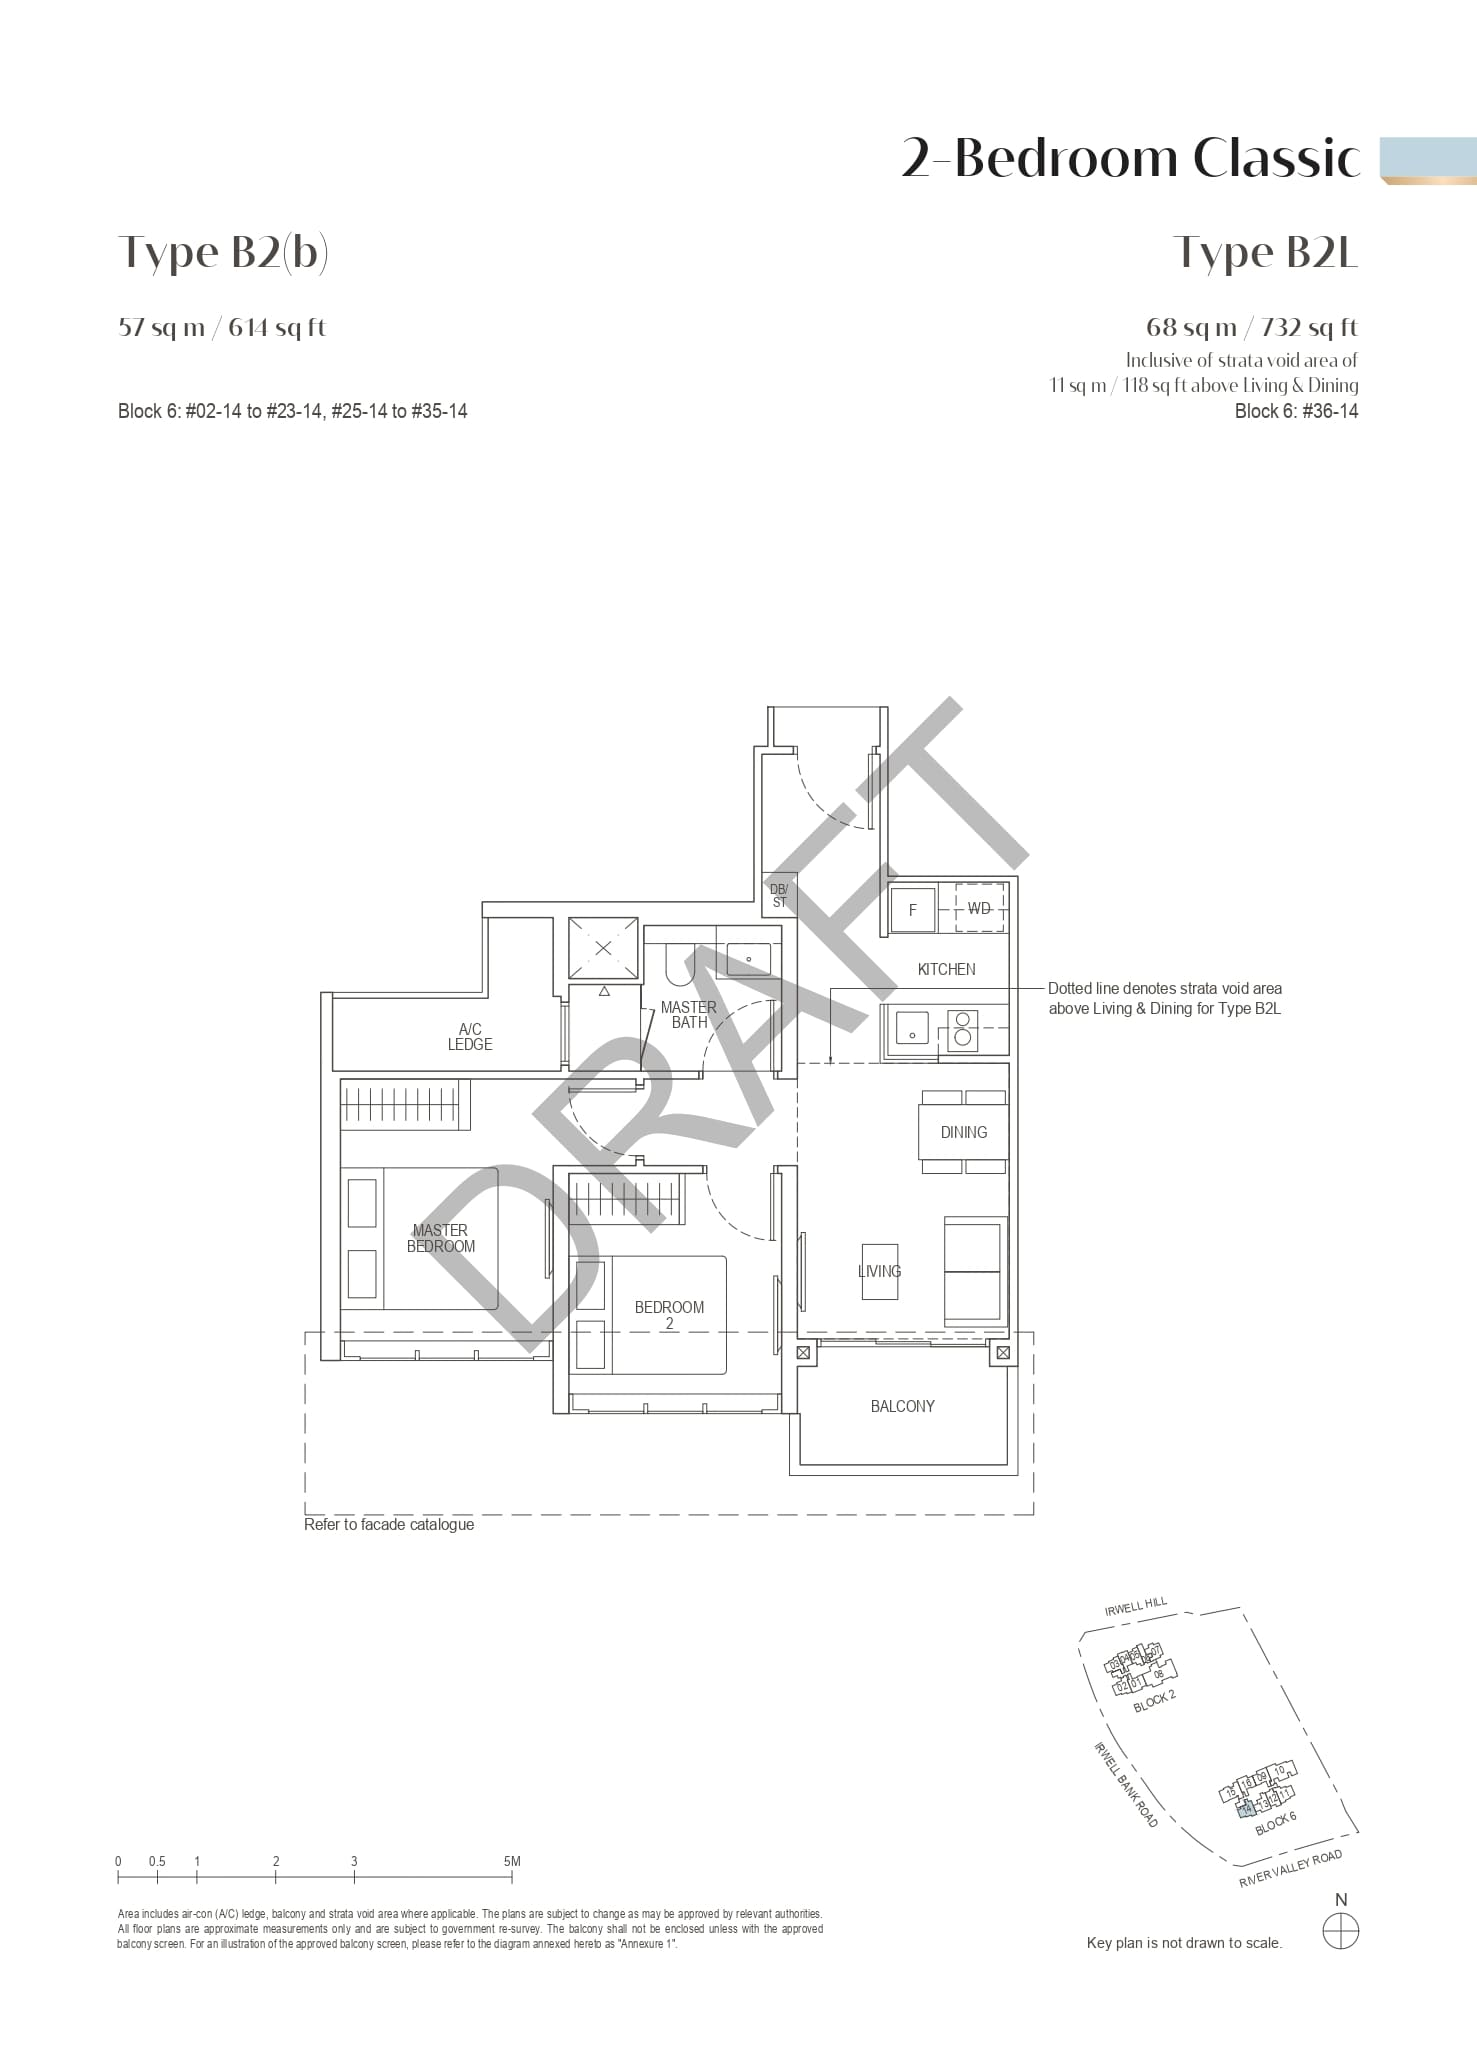 irwell-hill-residences-floor-plan-2-bedroom-classic-type-b2b